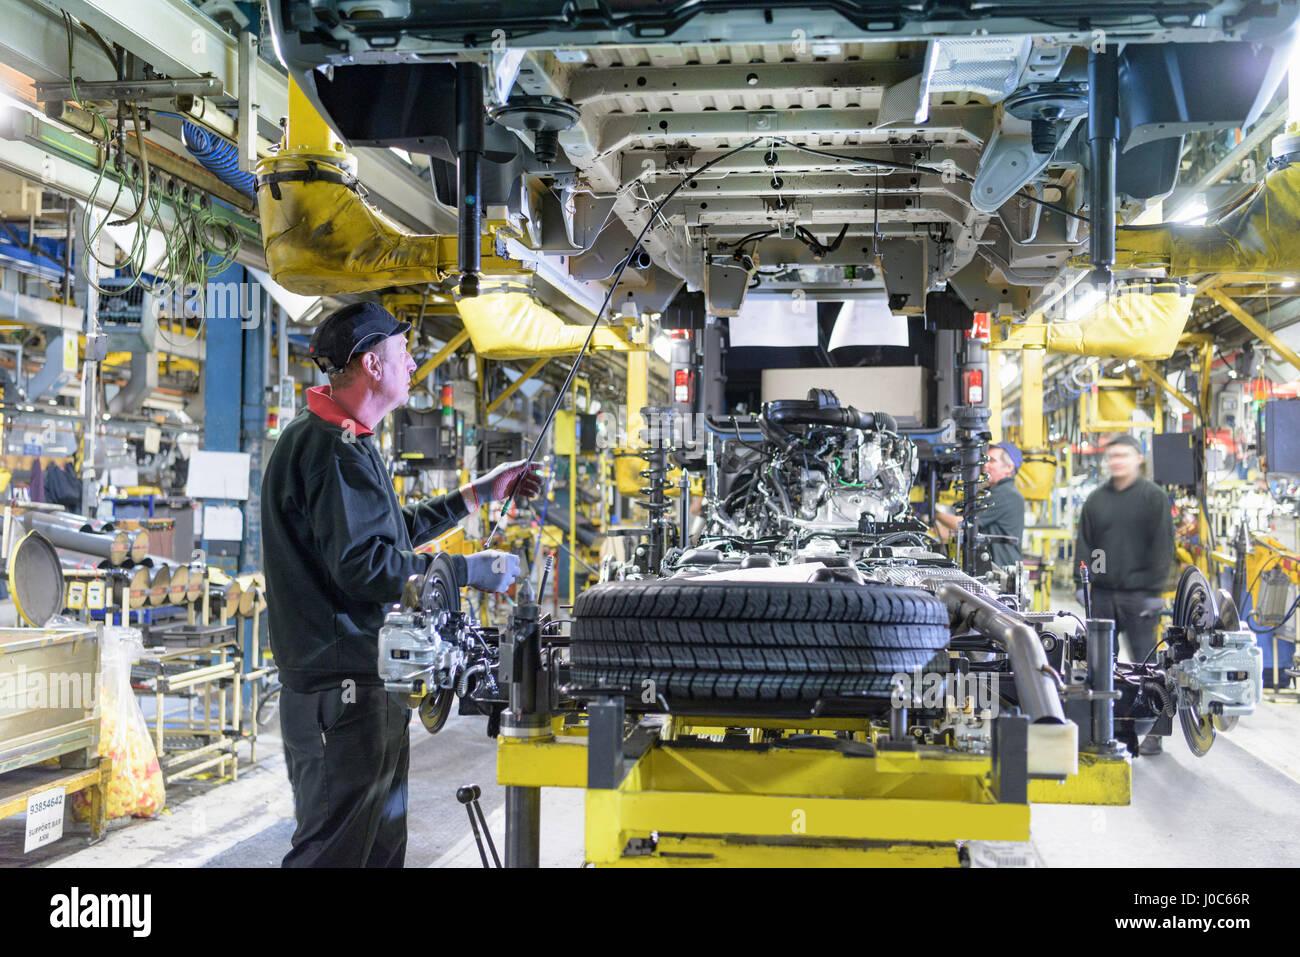 Arbeiter am Fließband in Automobilfabrik Stockbild